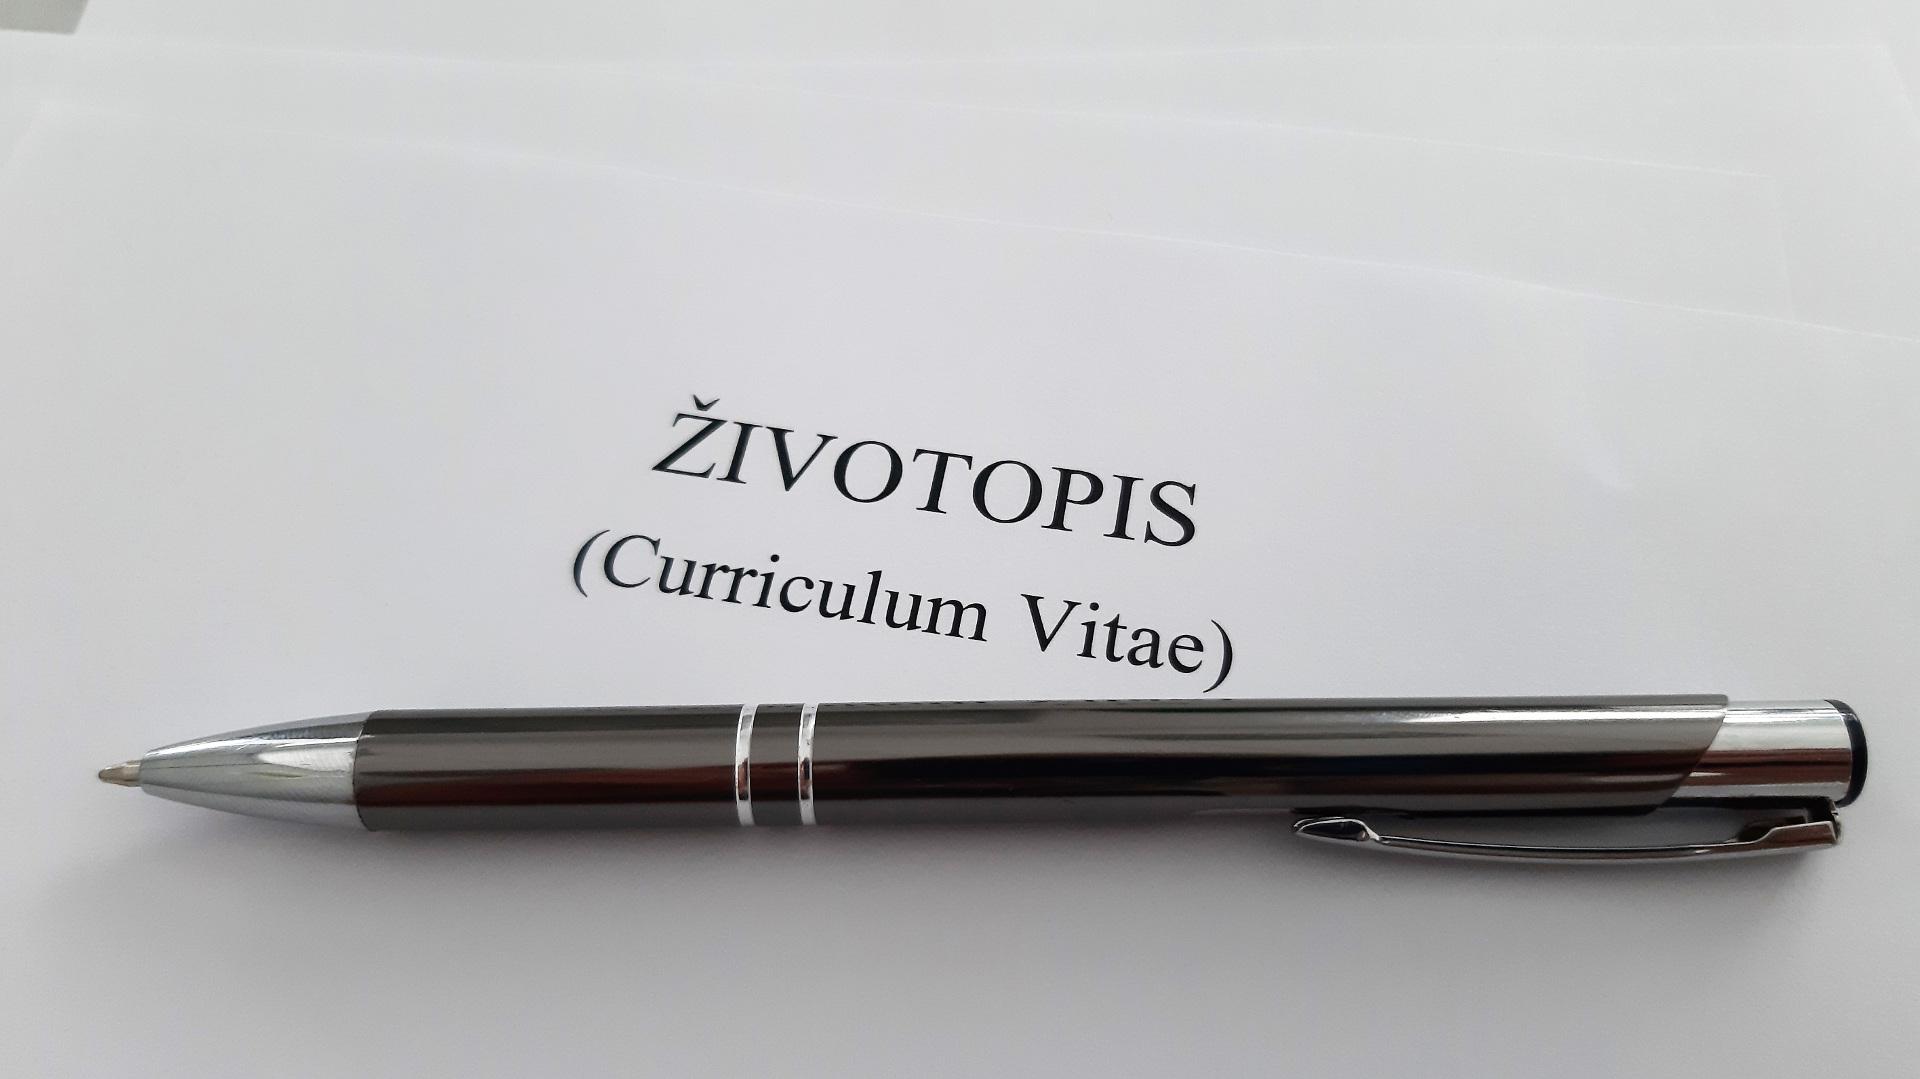 jak-napsat-zivotopis-vzor-zivotopisu